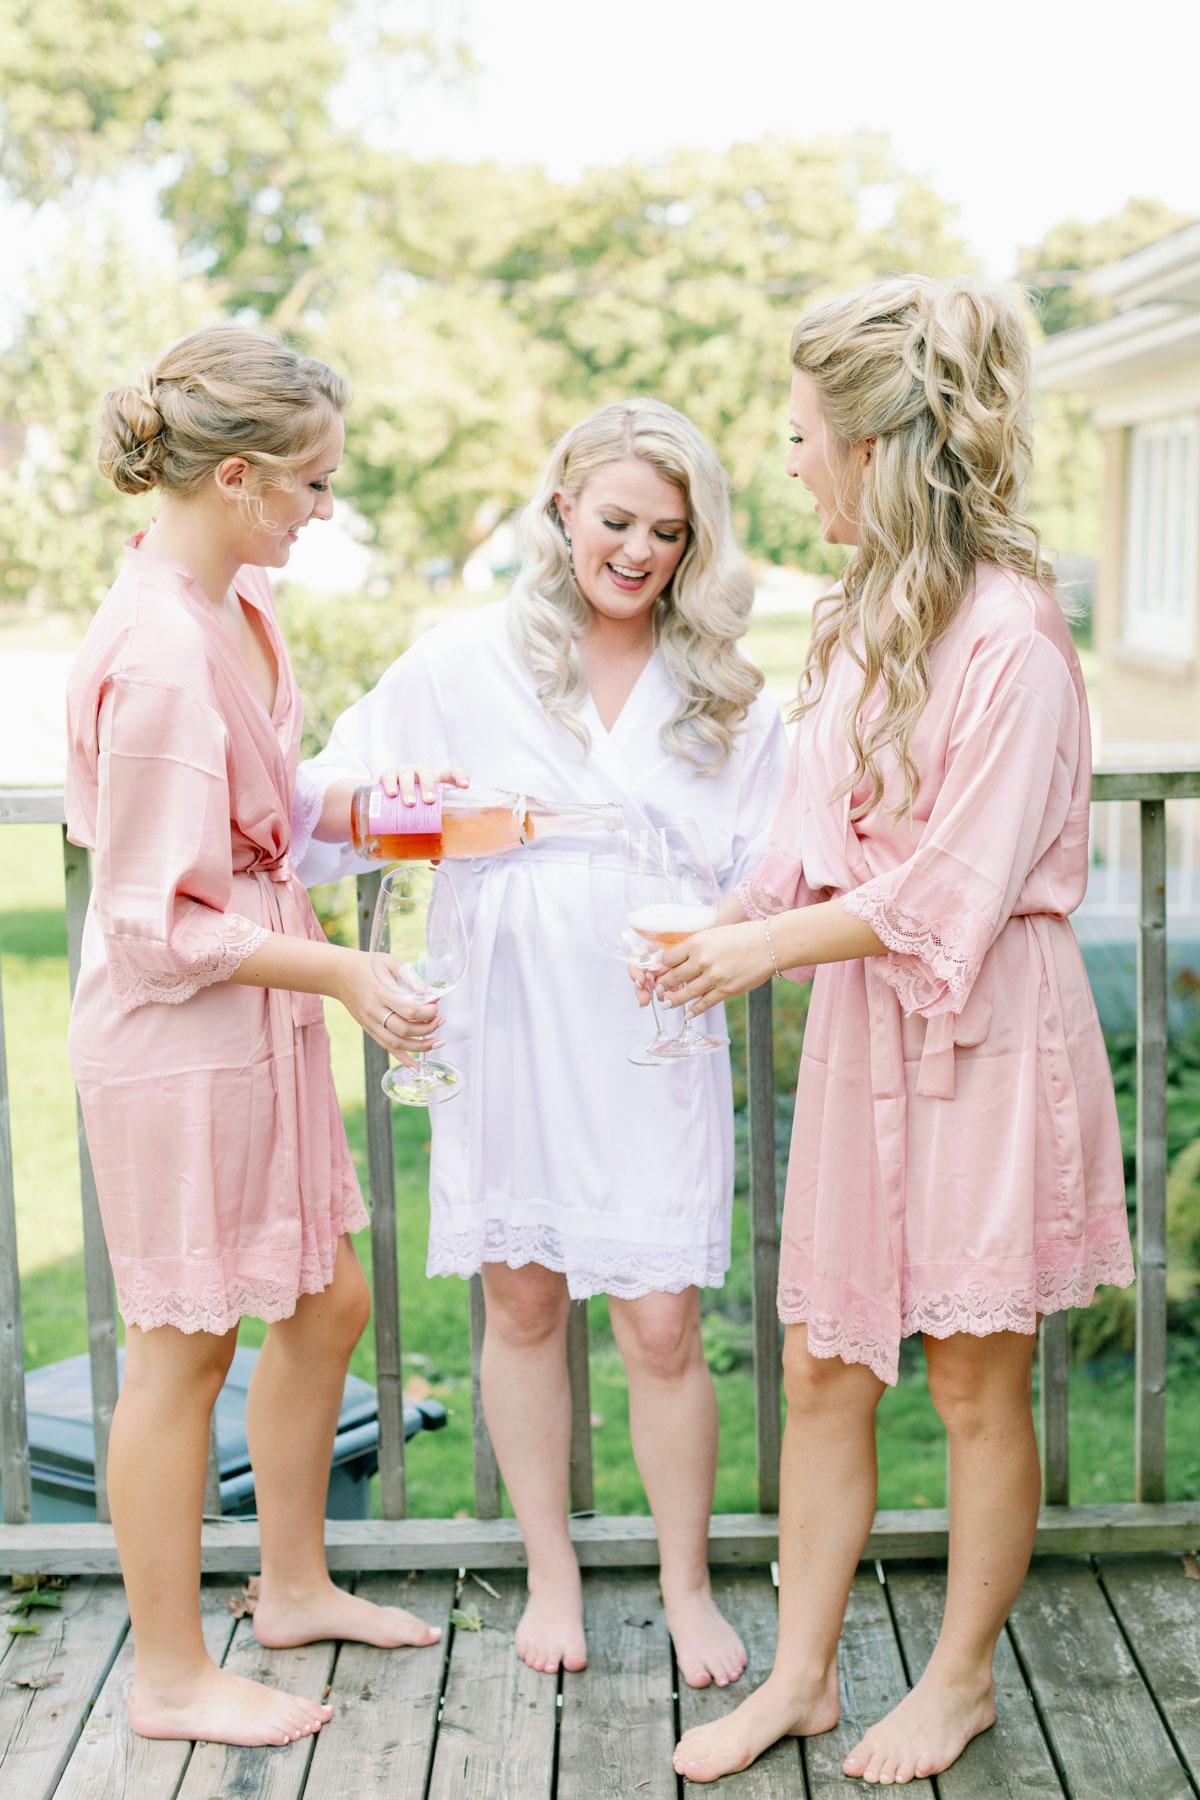 vineyard-bride-kayla-yestal-outdoor-summer-wedding-honsberger-estate-winery-niagara-toronto-vendor-0007.jpg